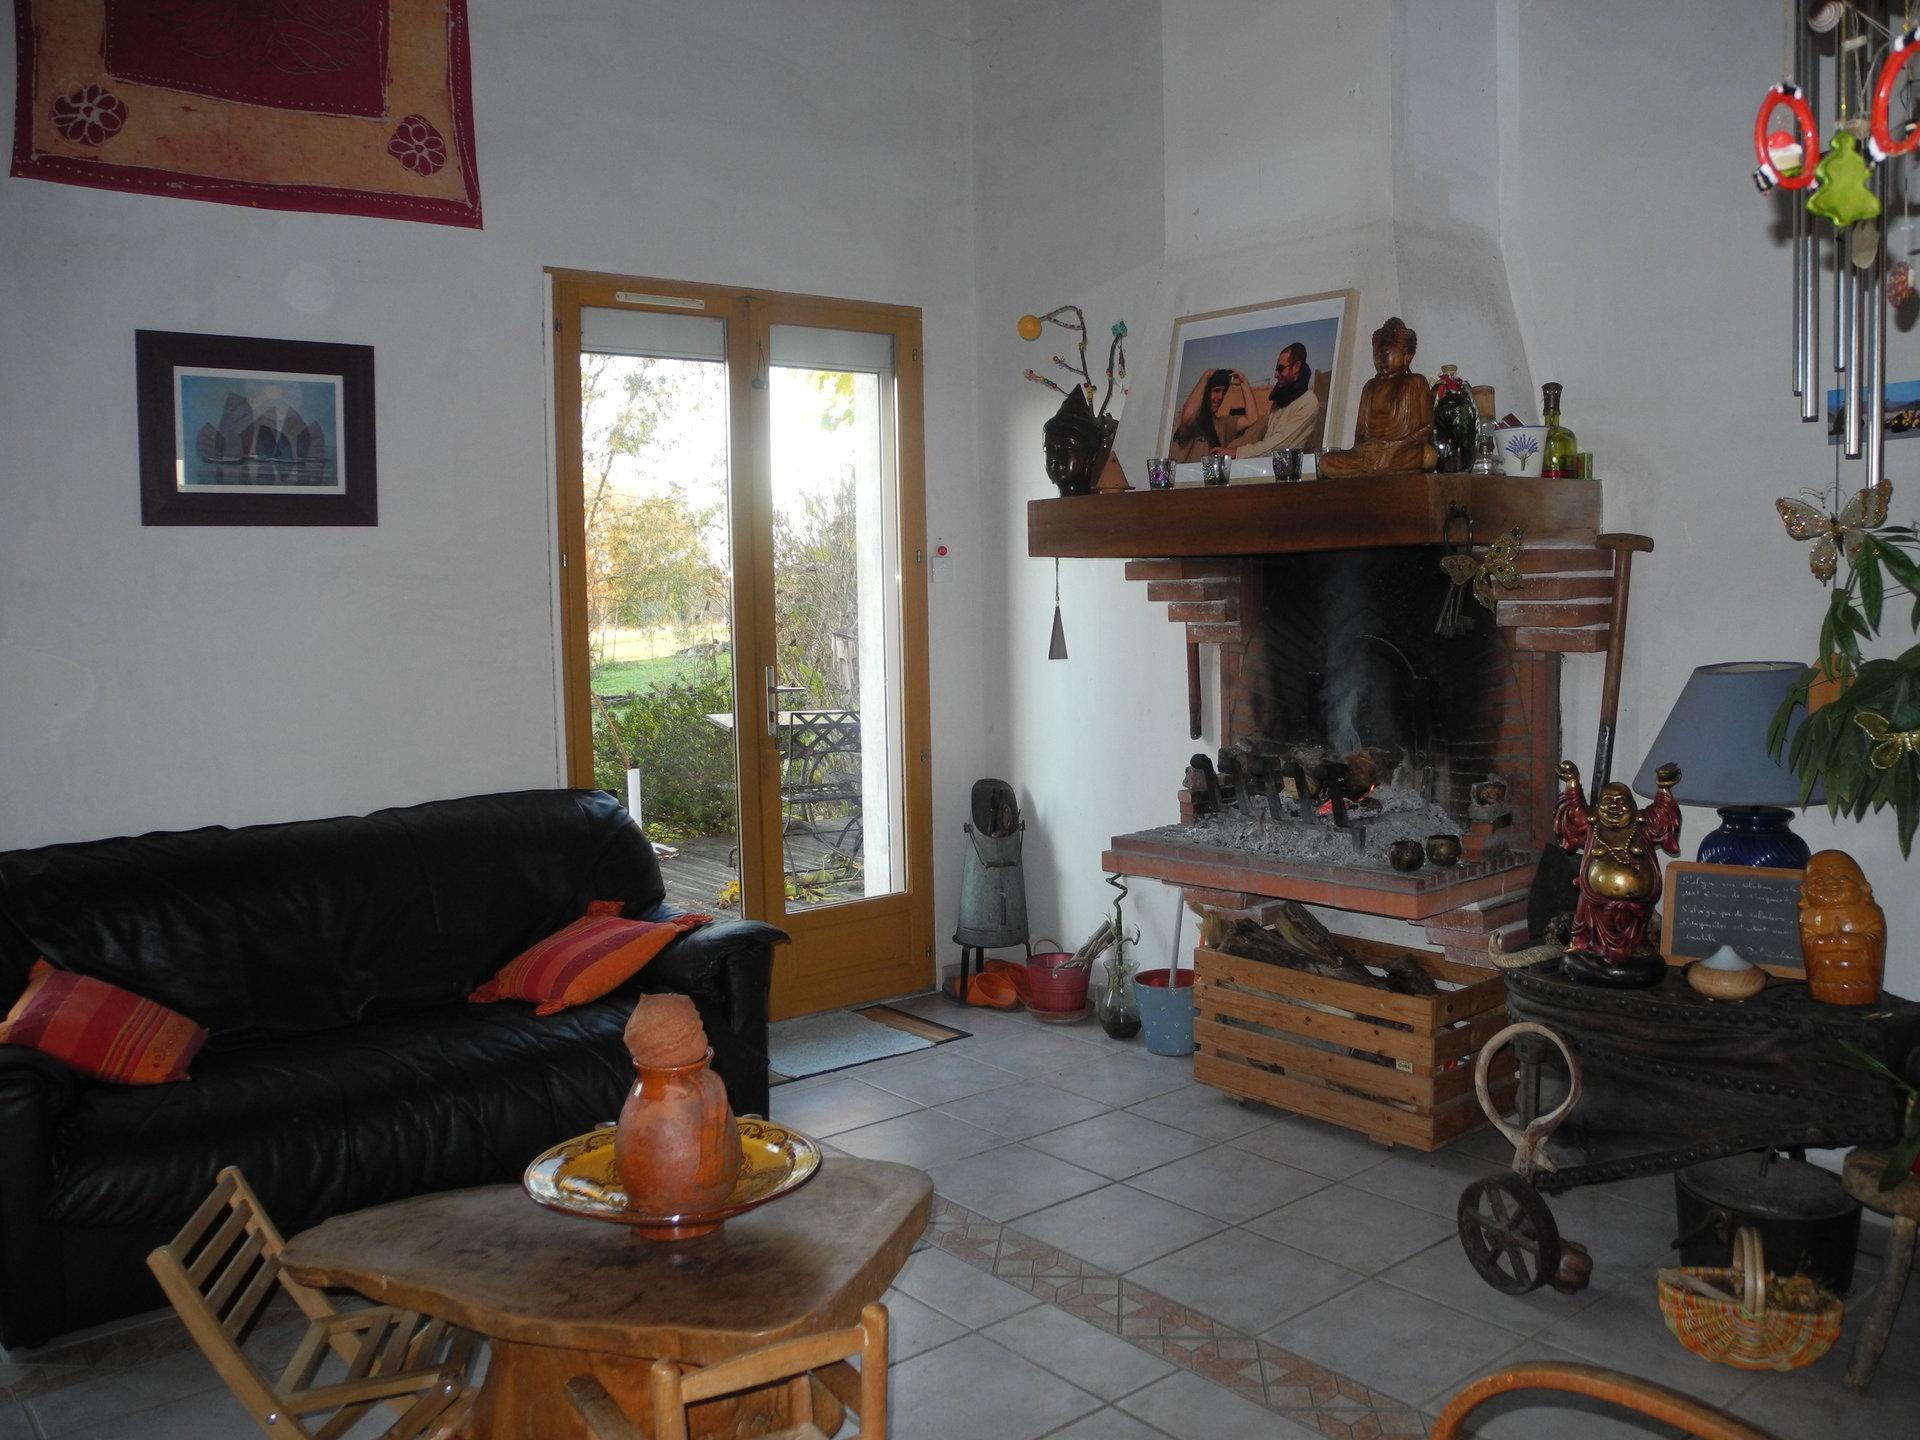 Venda Casa - Labastide-Beauvoir